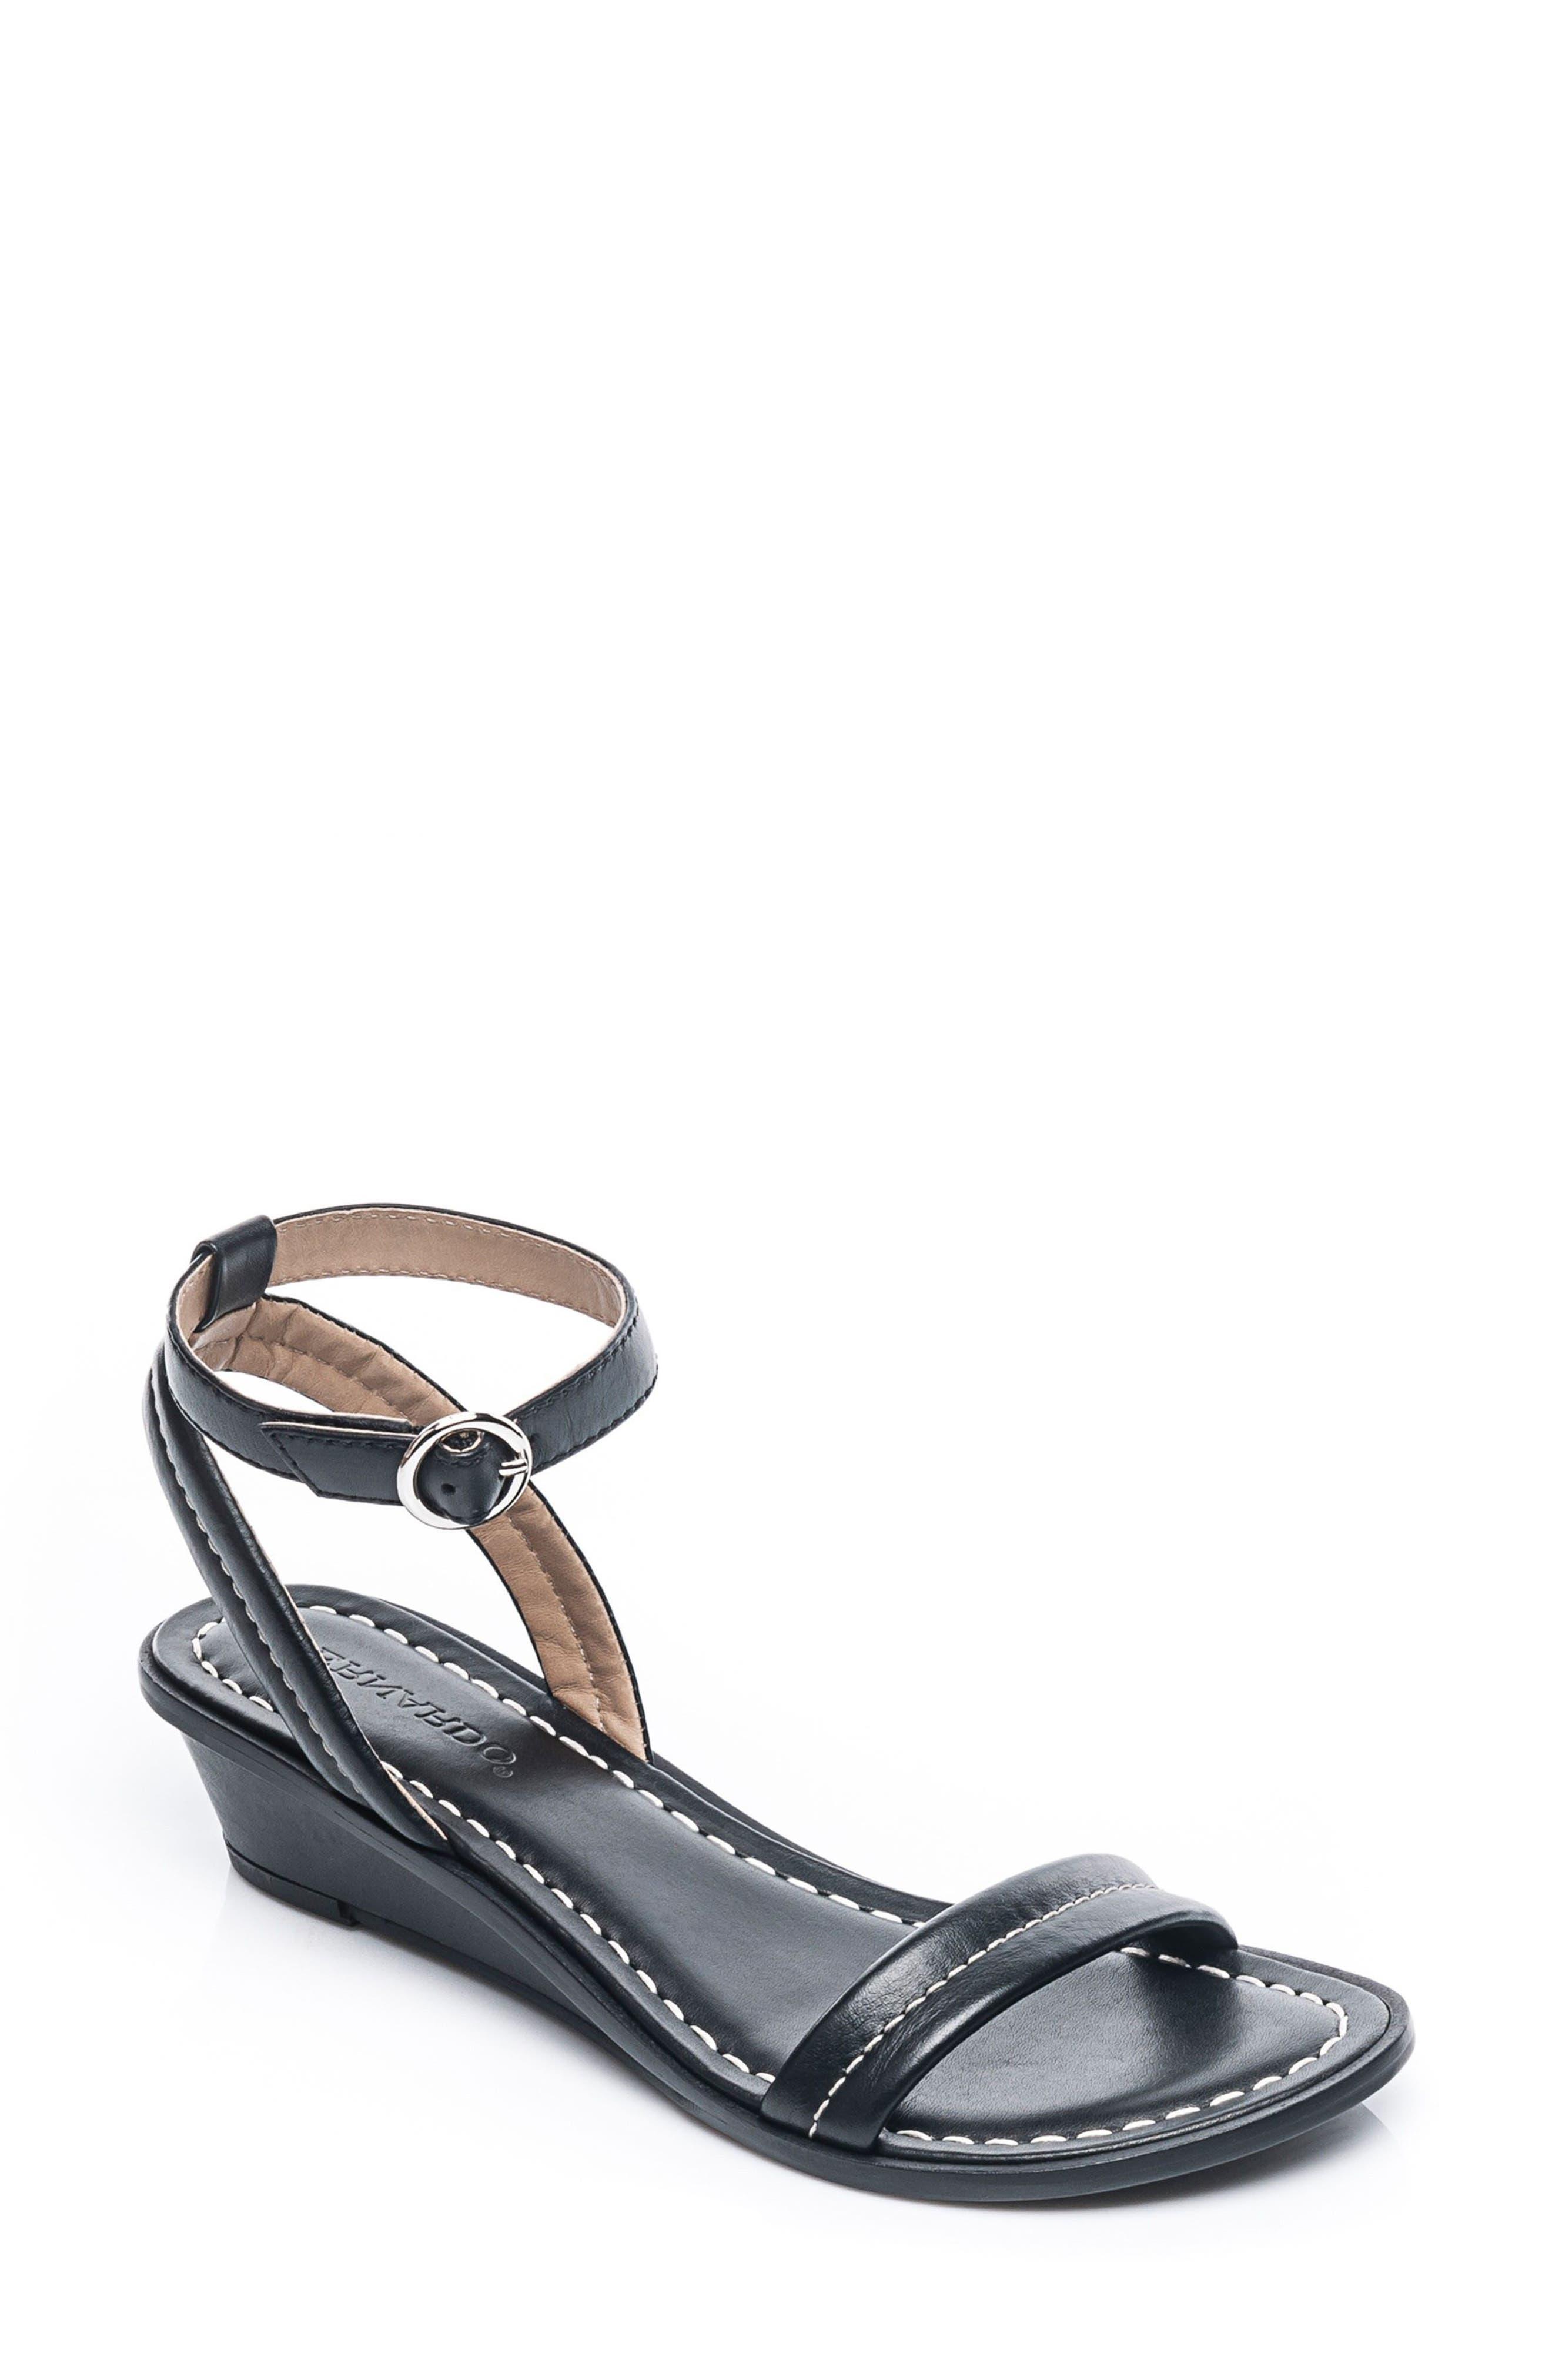 Bernardo Catherine Ankle Strap Sandal,                             Main thumbnail 1, color,                             BLACK ANTIQUE